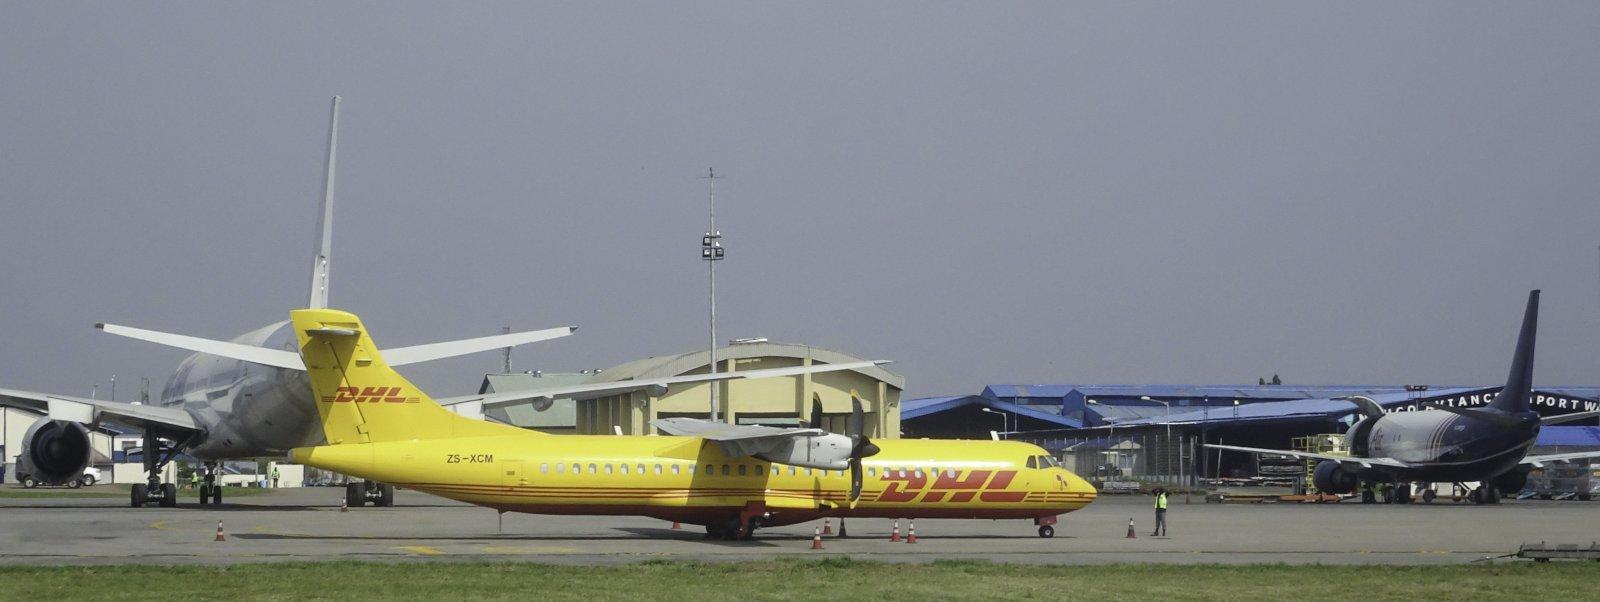 Solenta Aviation / DHL ATR 72-212F ZS-XCM